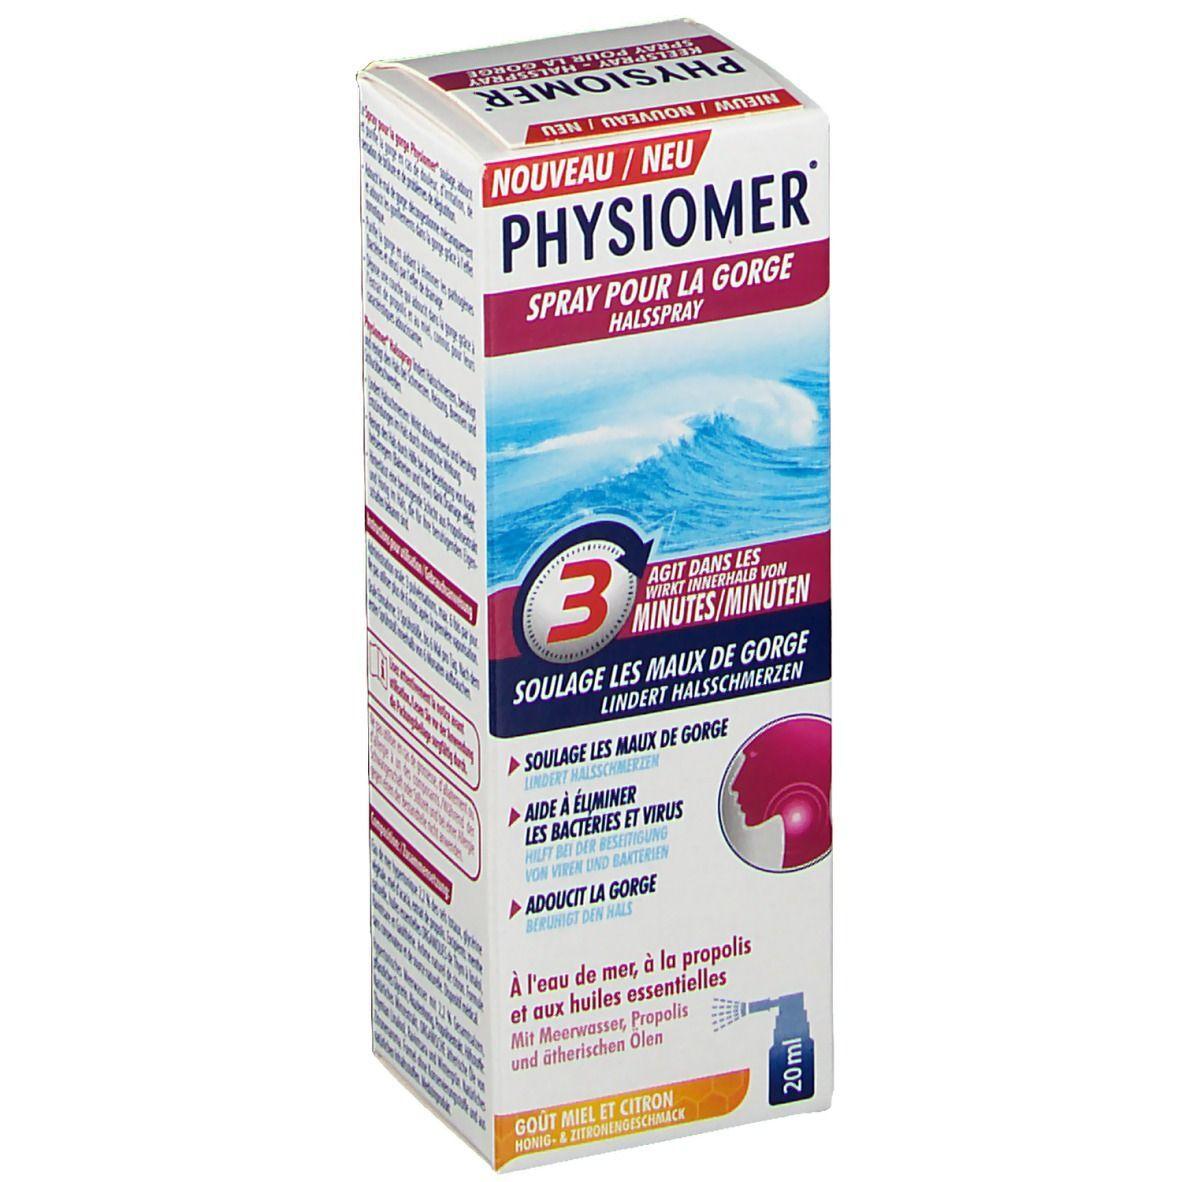 Physiomer® Spray pour la gorge ml spray buccal